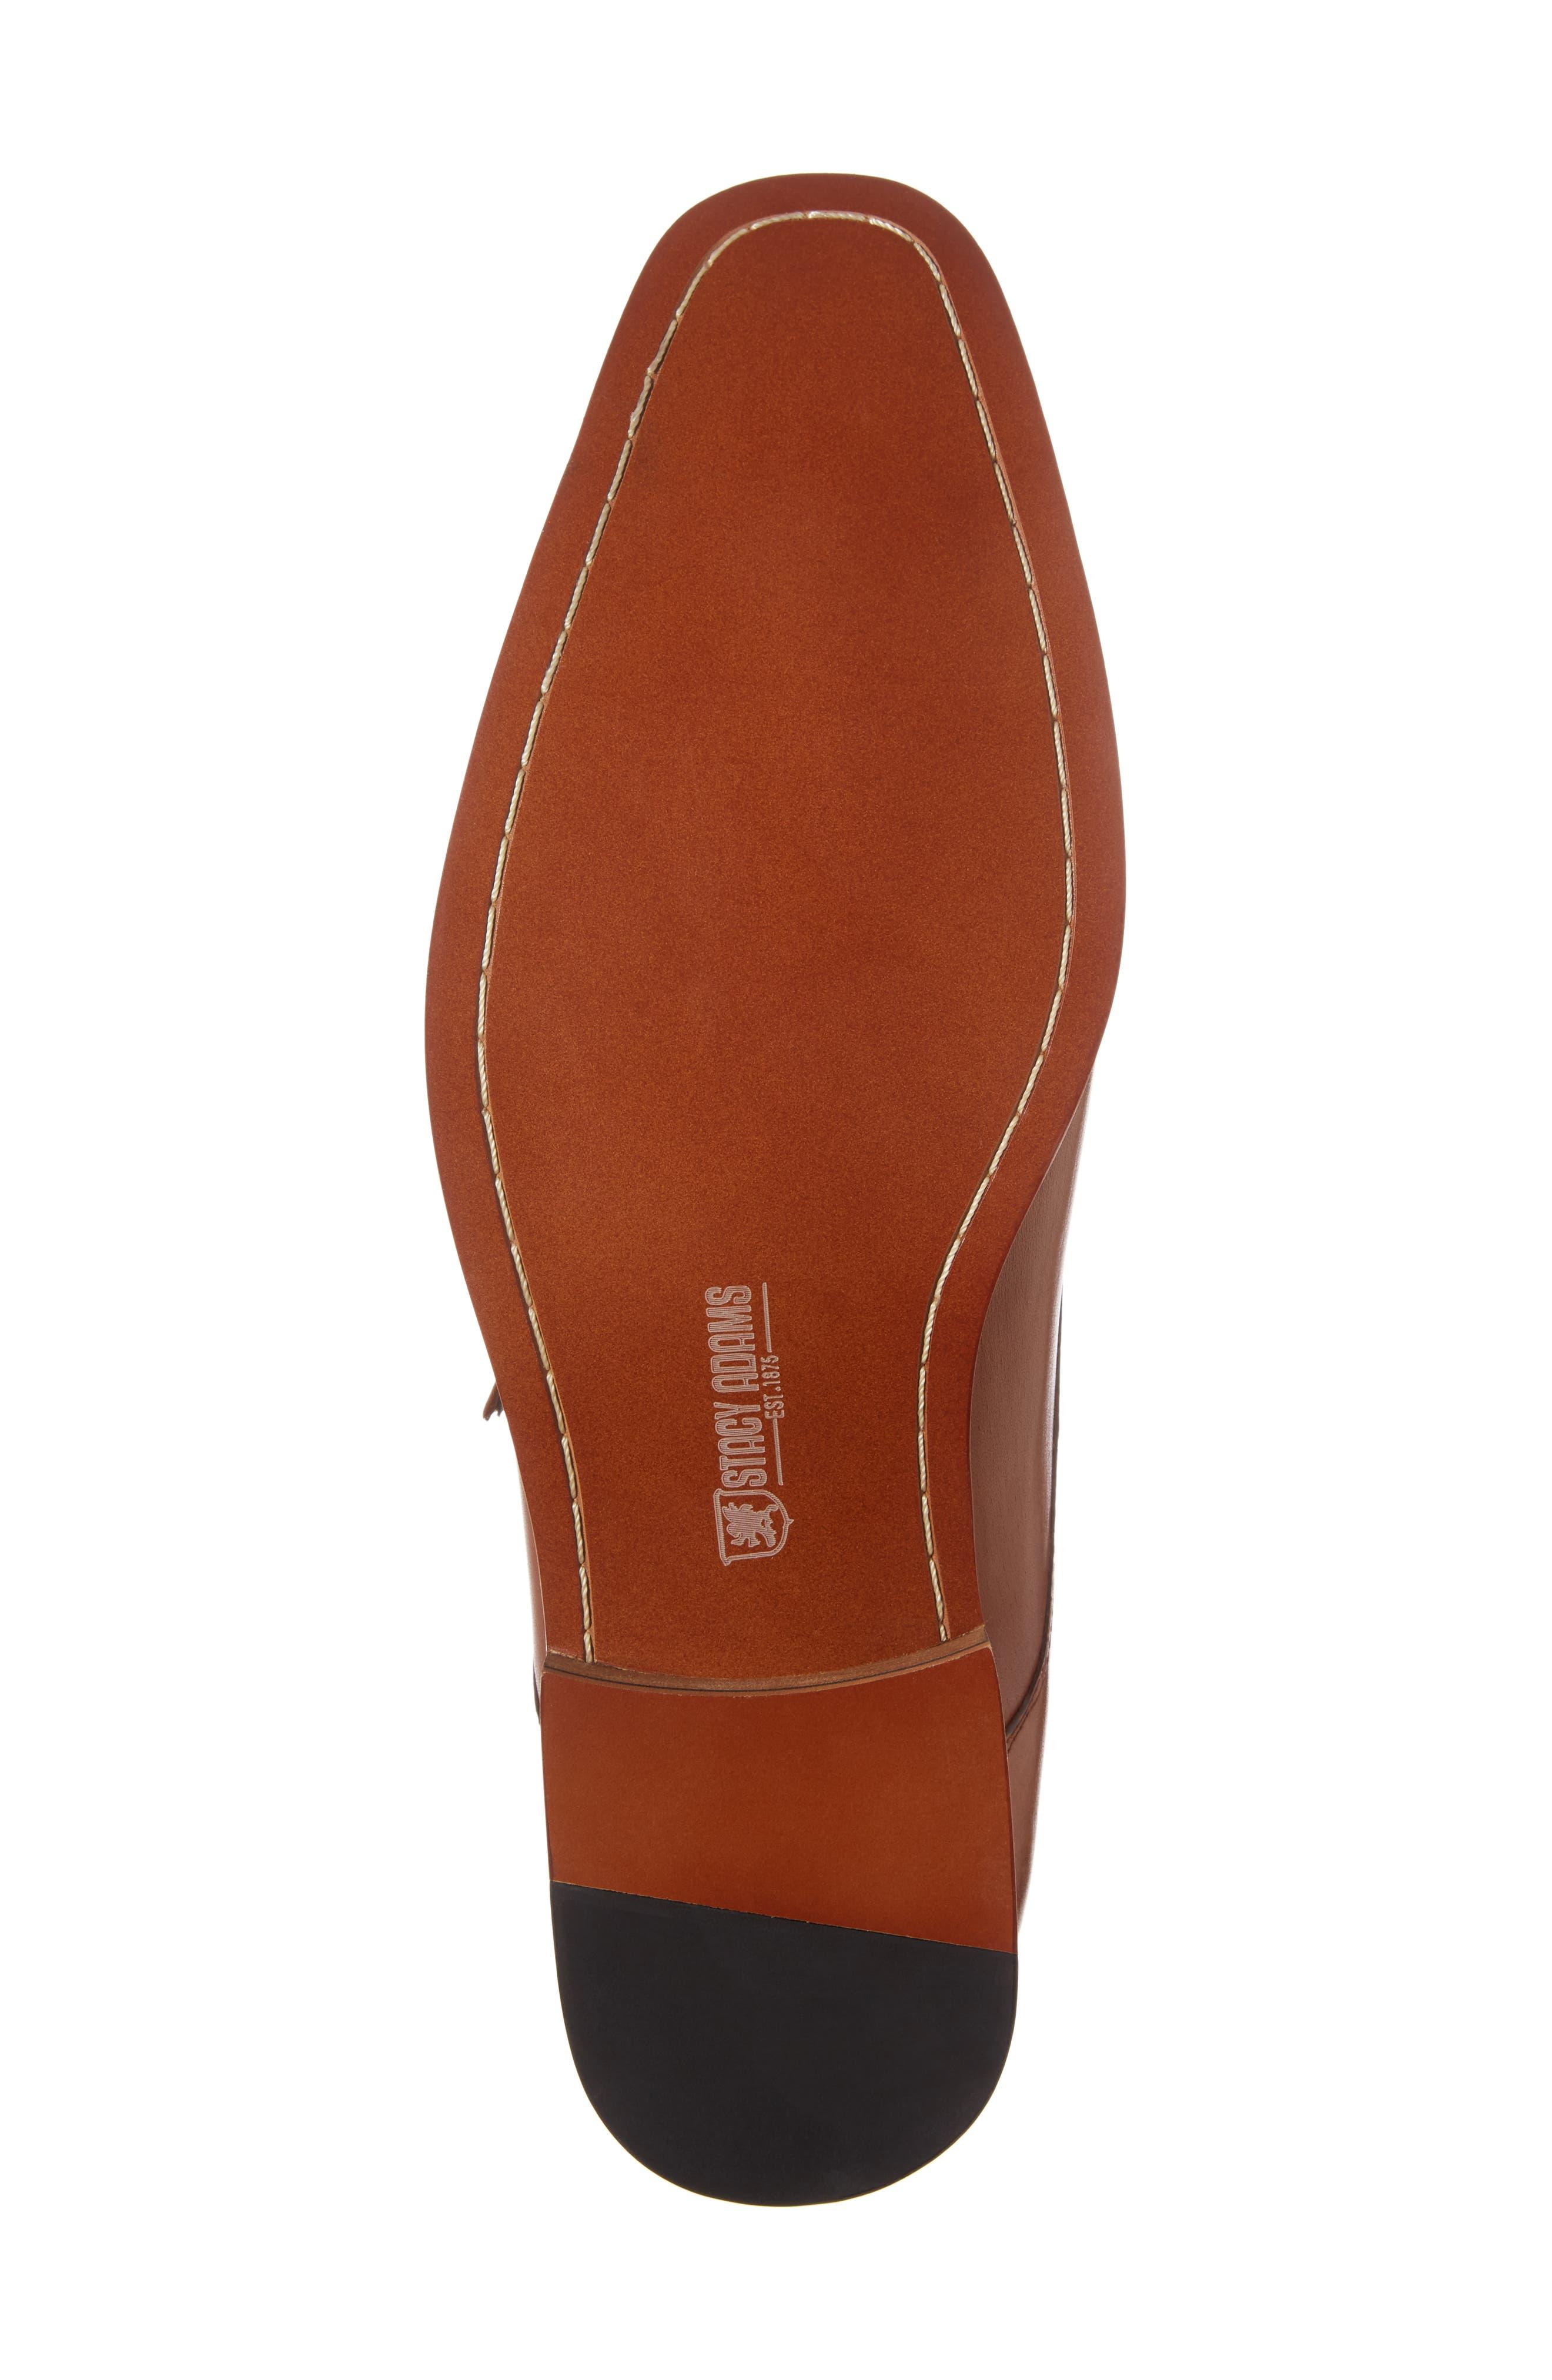 Kimball Monk Strap Shoe,                             Alternate thumbnail 6, color,                             SADDLE TAN LEATHER